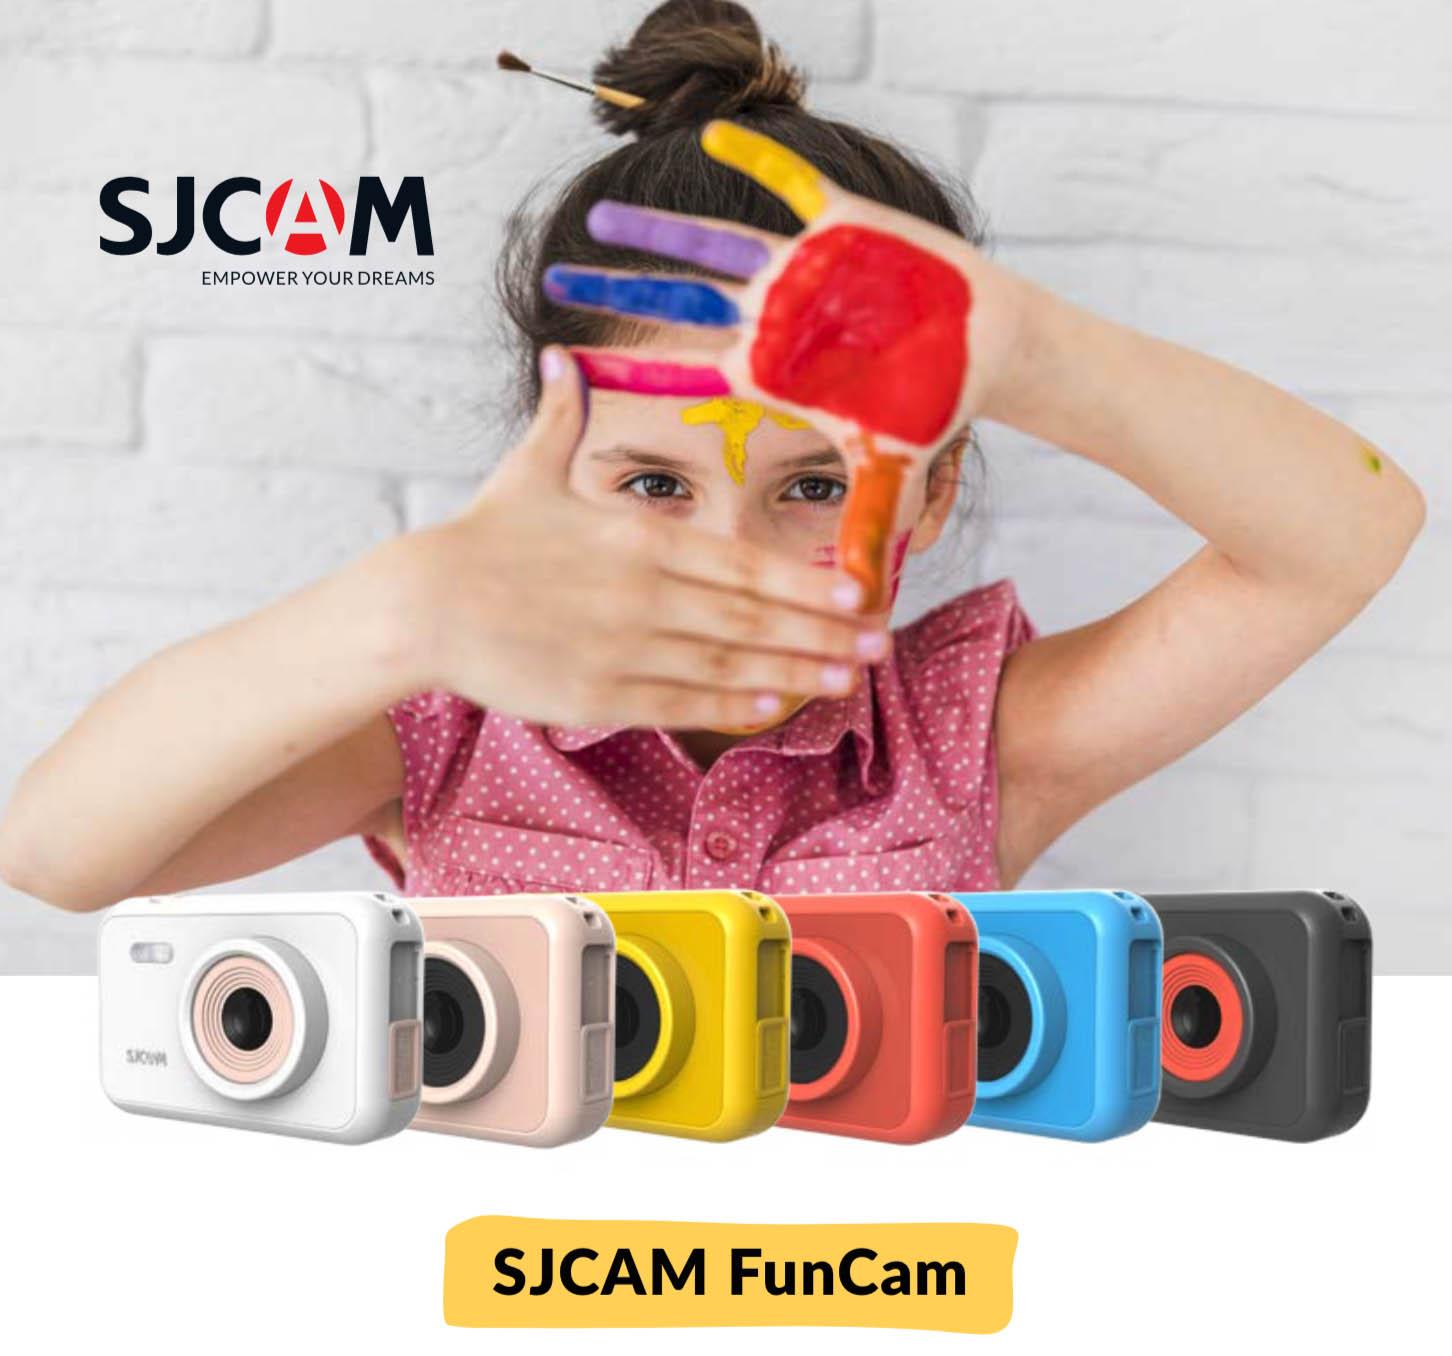 funcam-kids-hd-camera-features-main.jpg